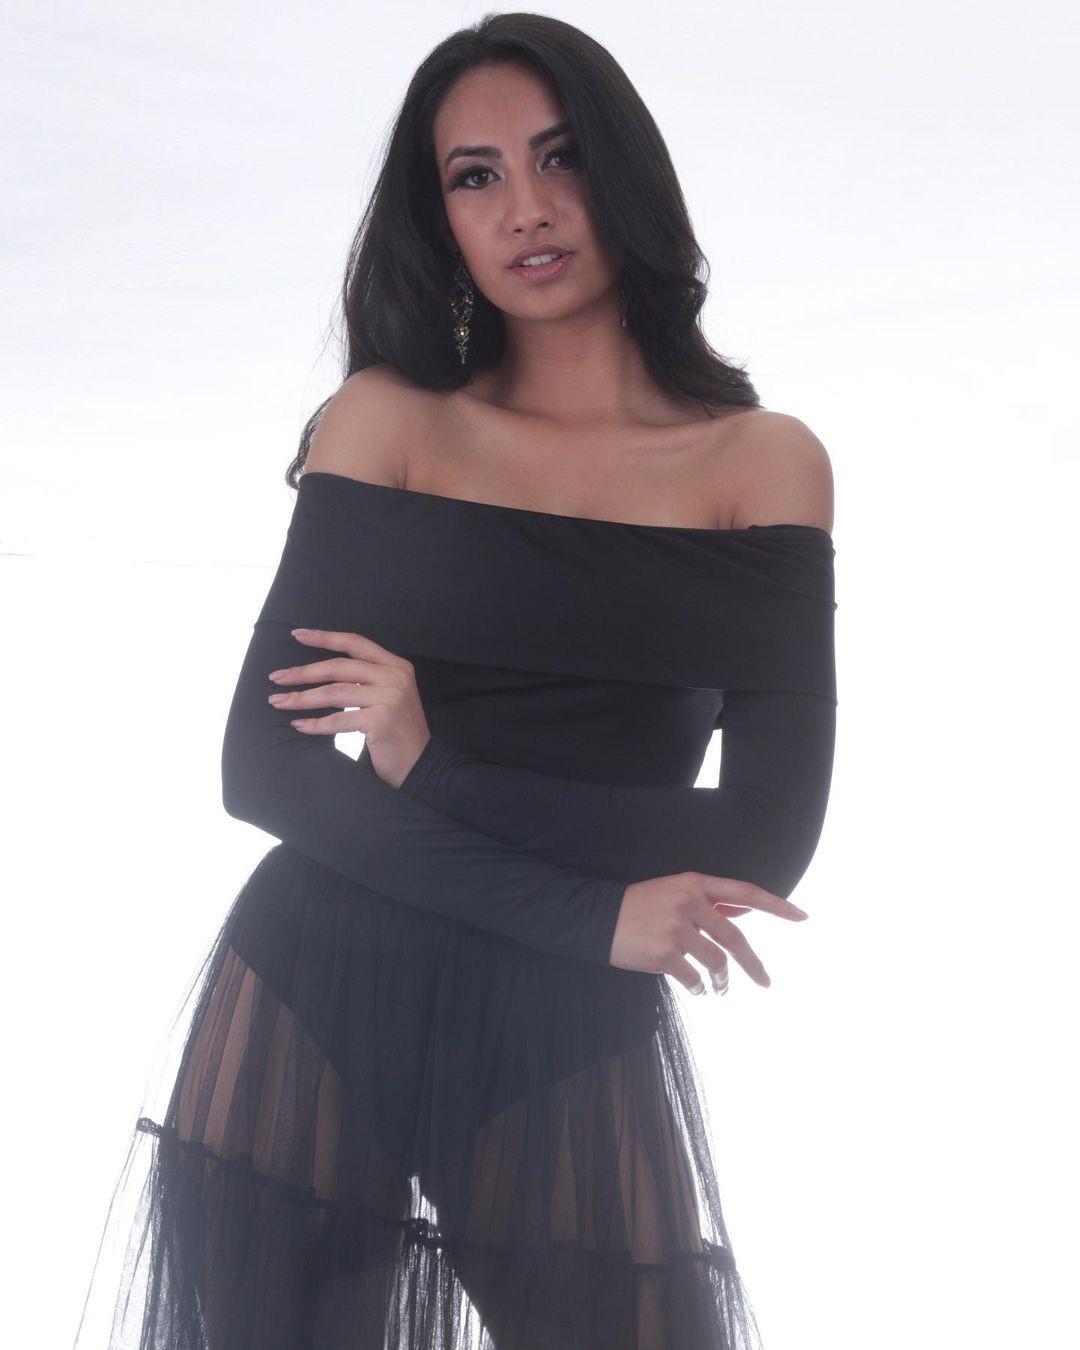 sandy menezes, miss grande sao paulo mundo 2019. - Página 2 Fmzeji10